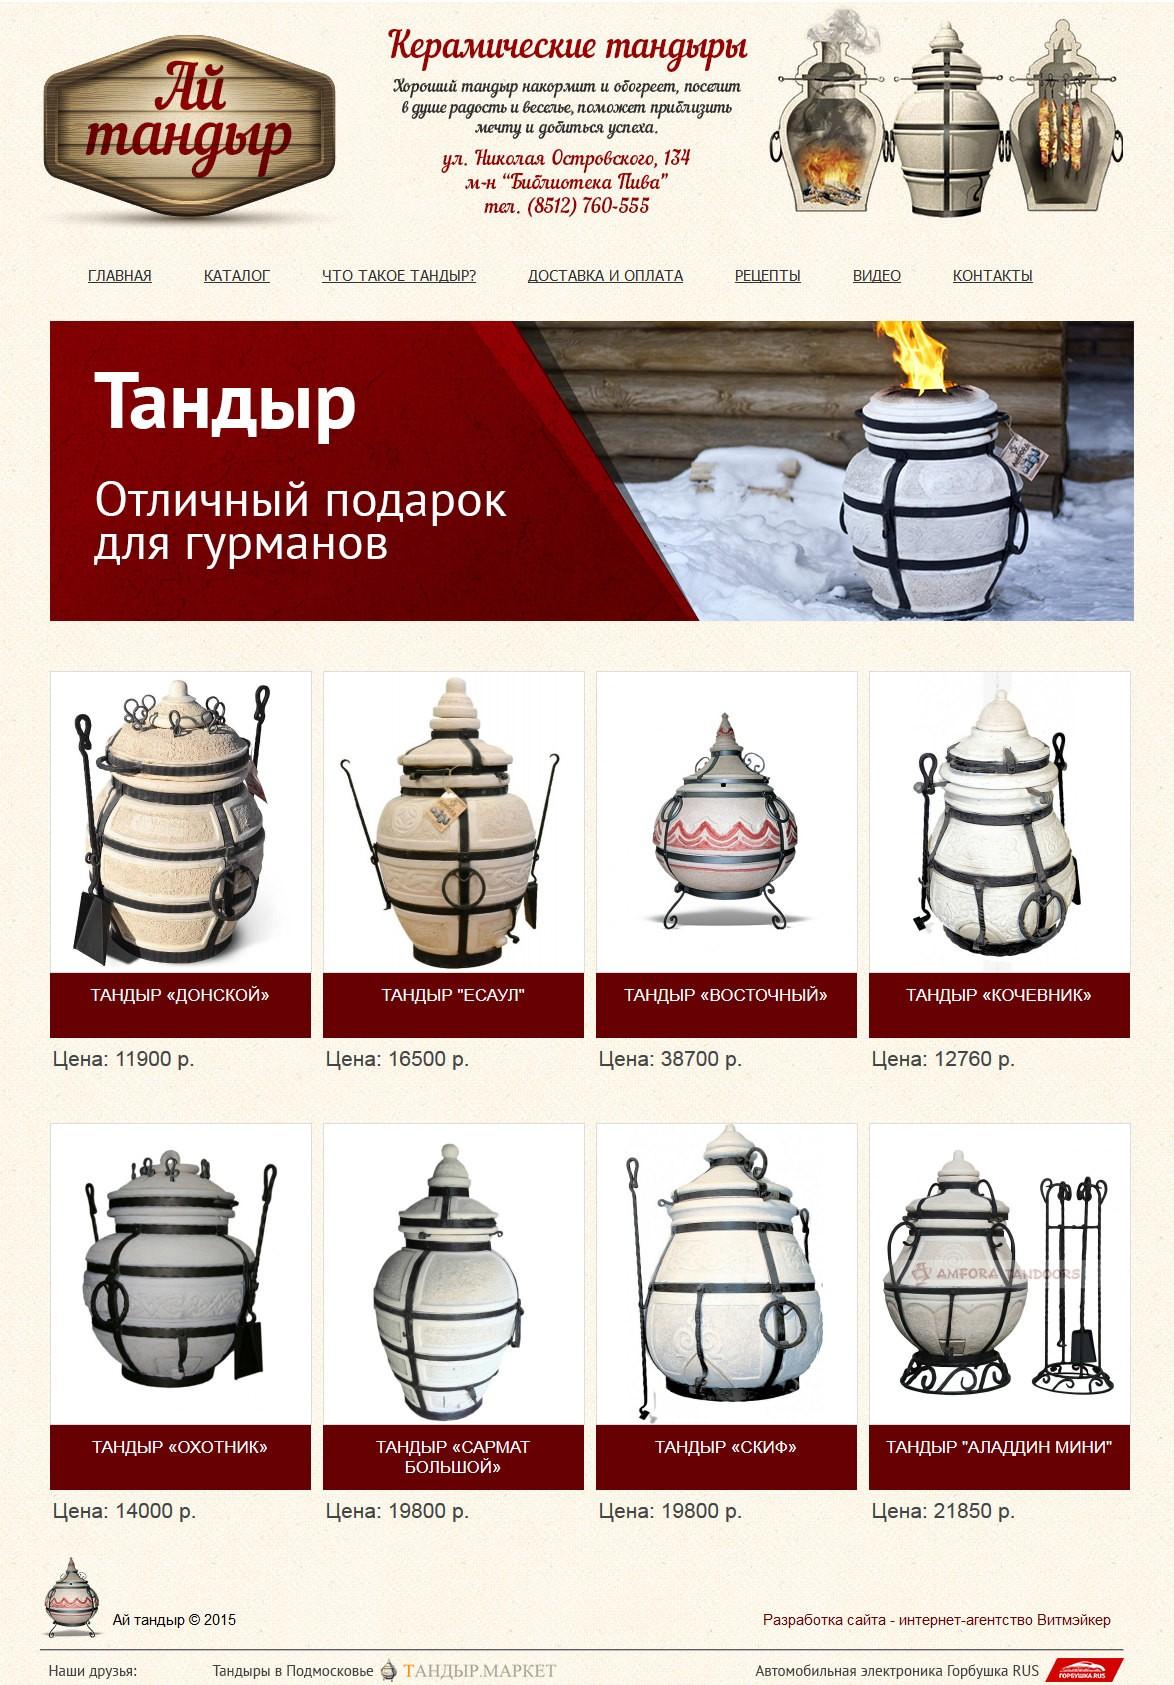 Создание сайта для магазина Ай тандыр